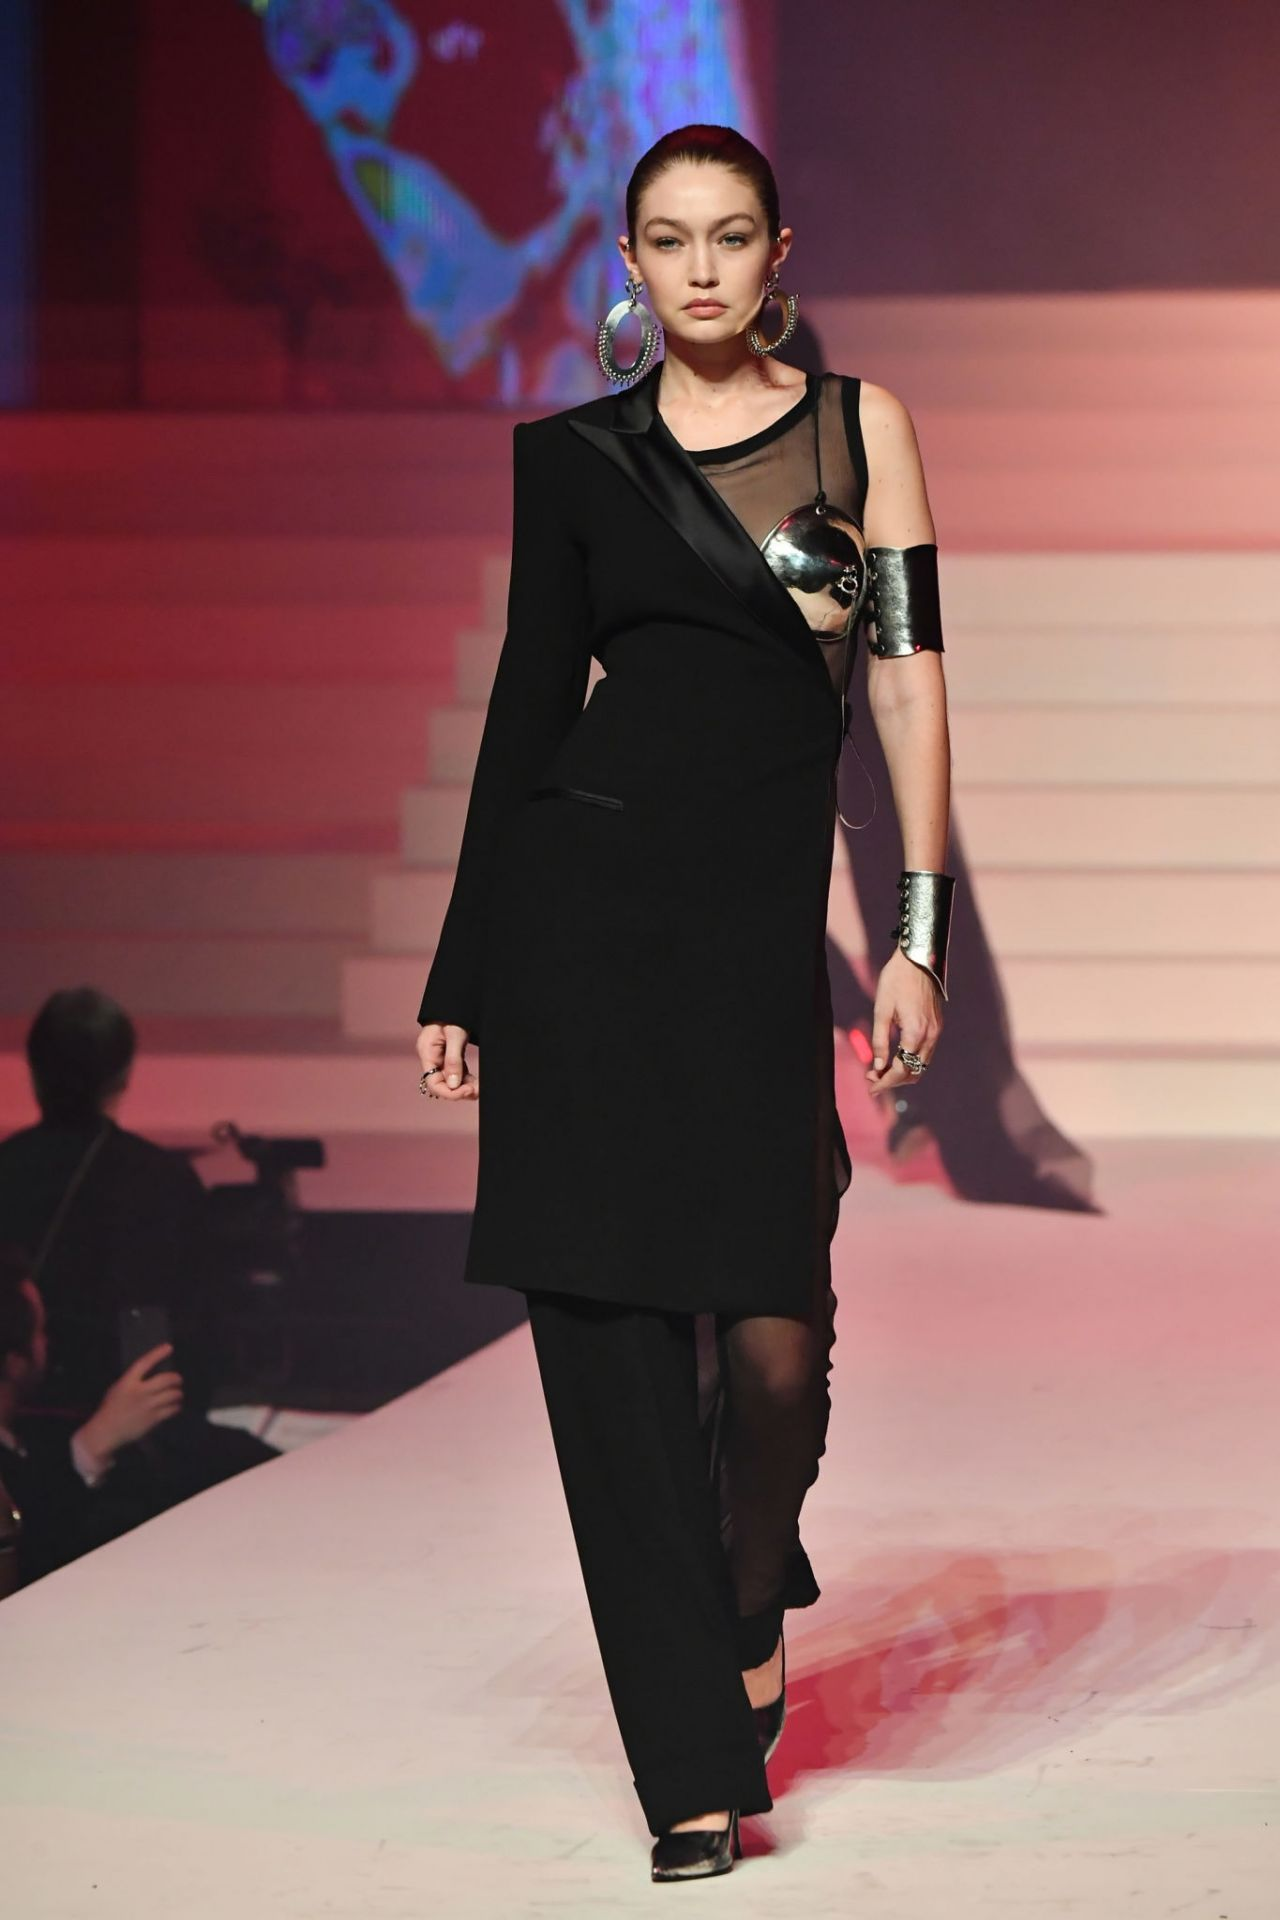 gigi-hadid-walks-jean-paul-gualtier-haute-couture-show-at-paris-fashion-week